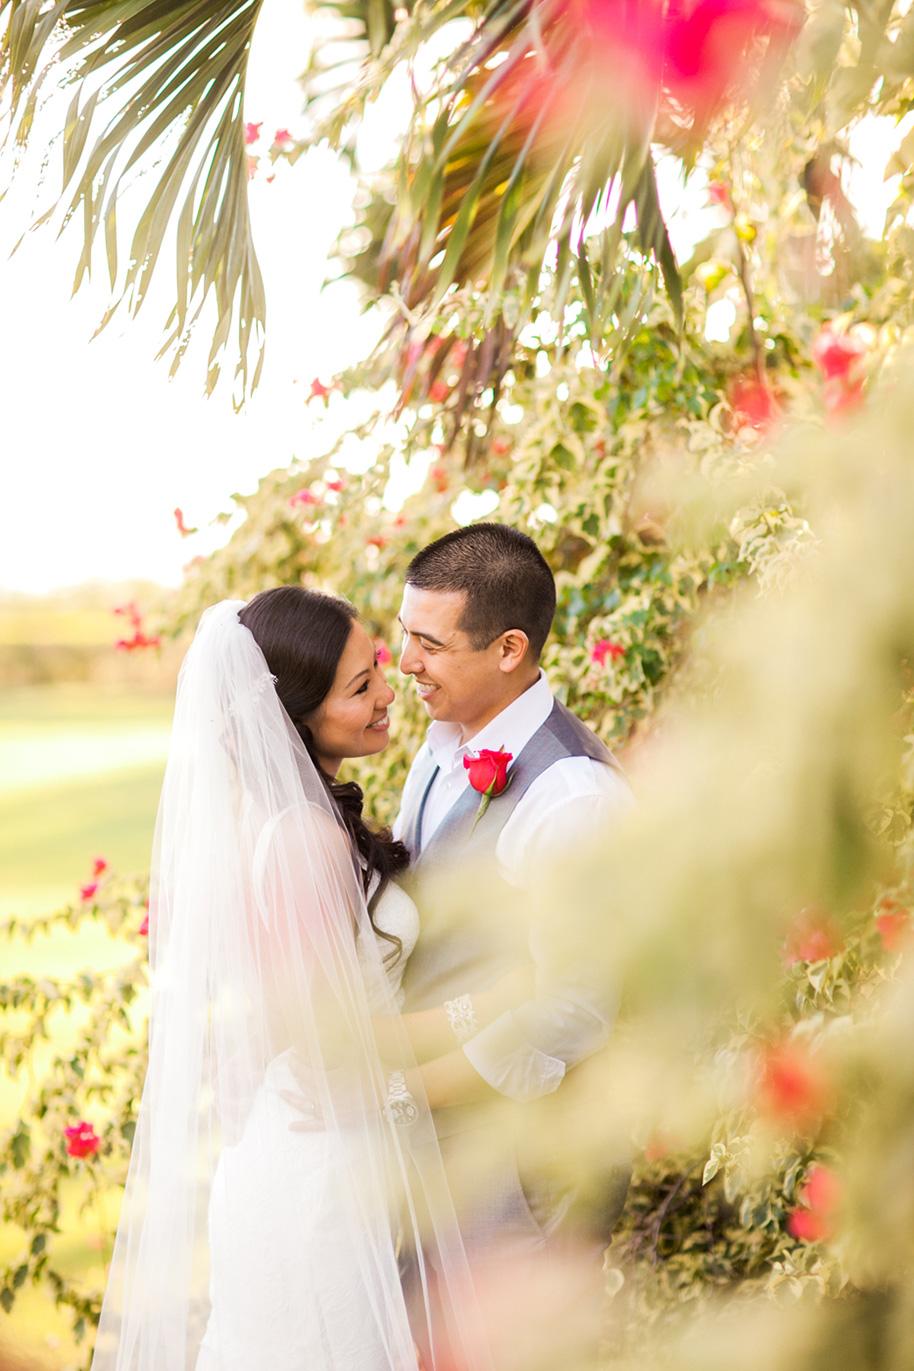 Maui-Beach-Wedding-041216-16